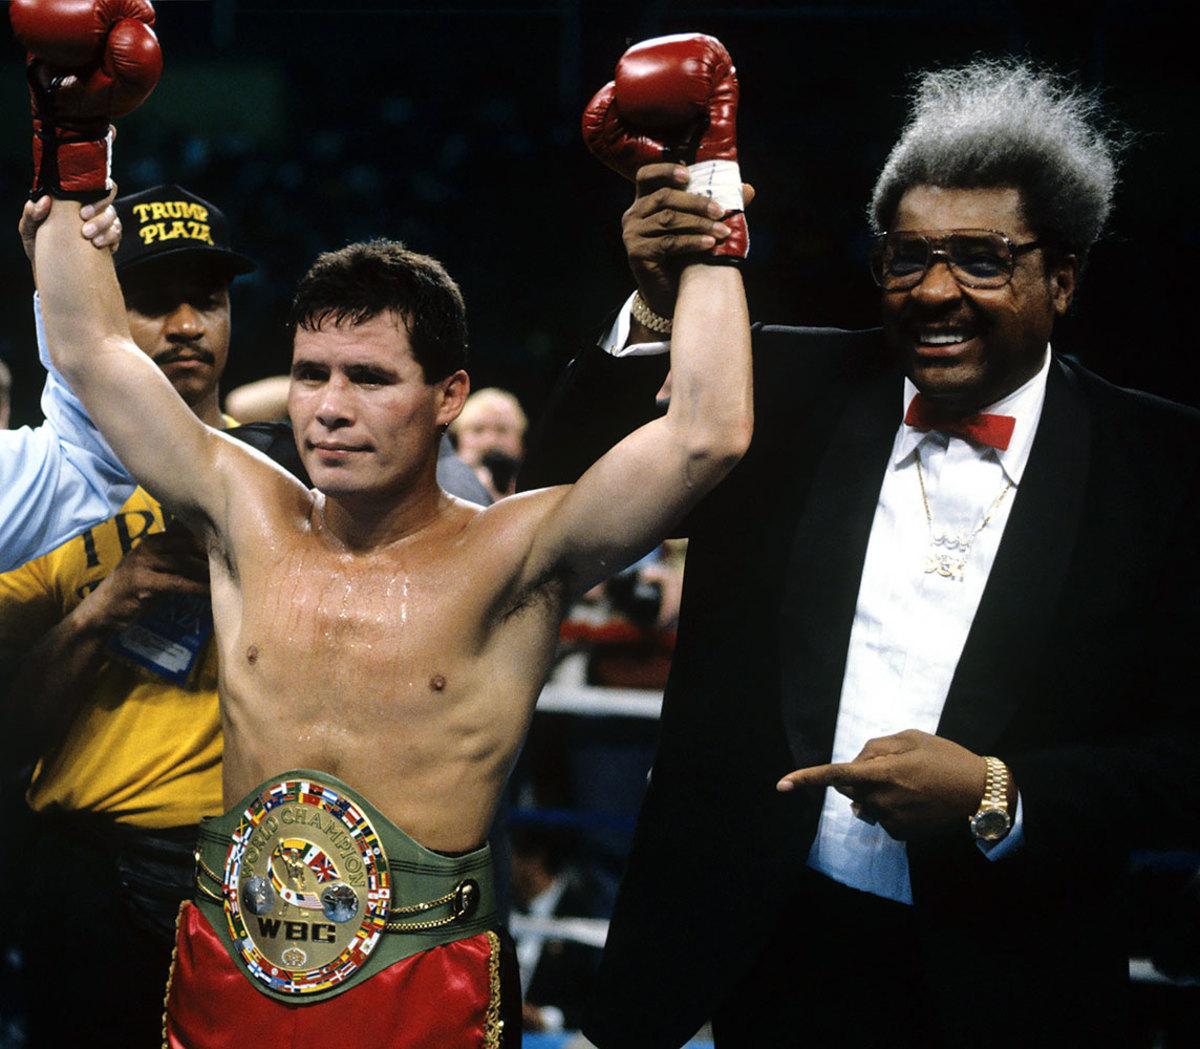 1990-1208-Don-King-Julio-Cesar-Chavez-NLC_01194.jpg